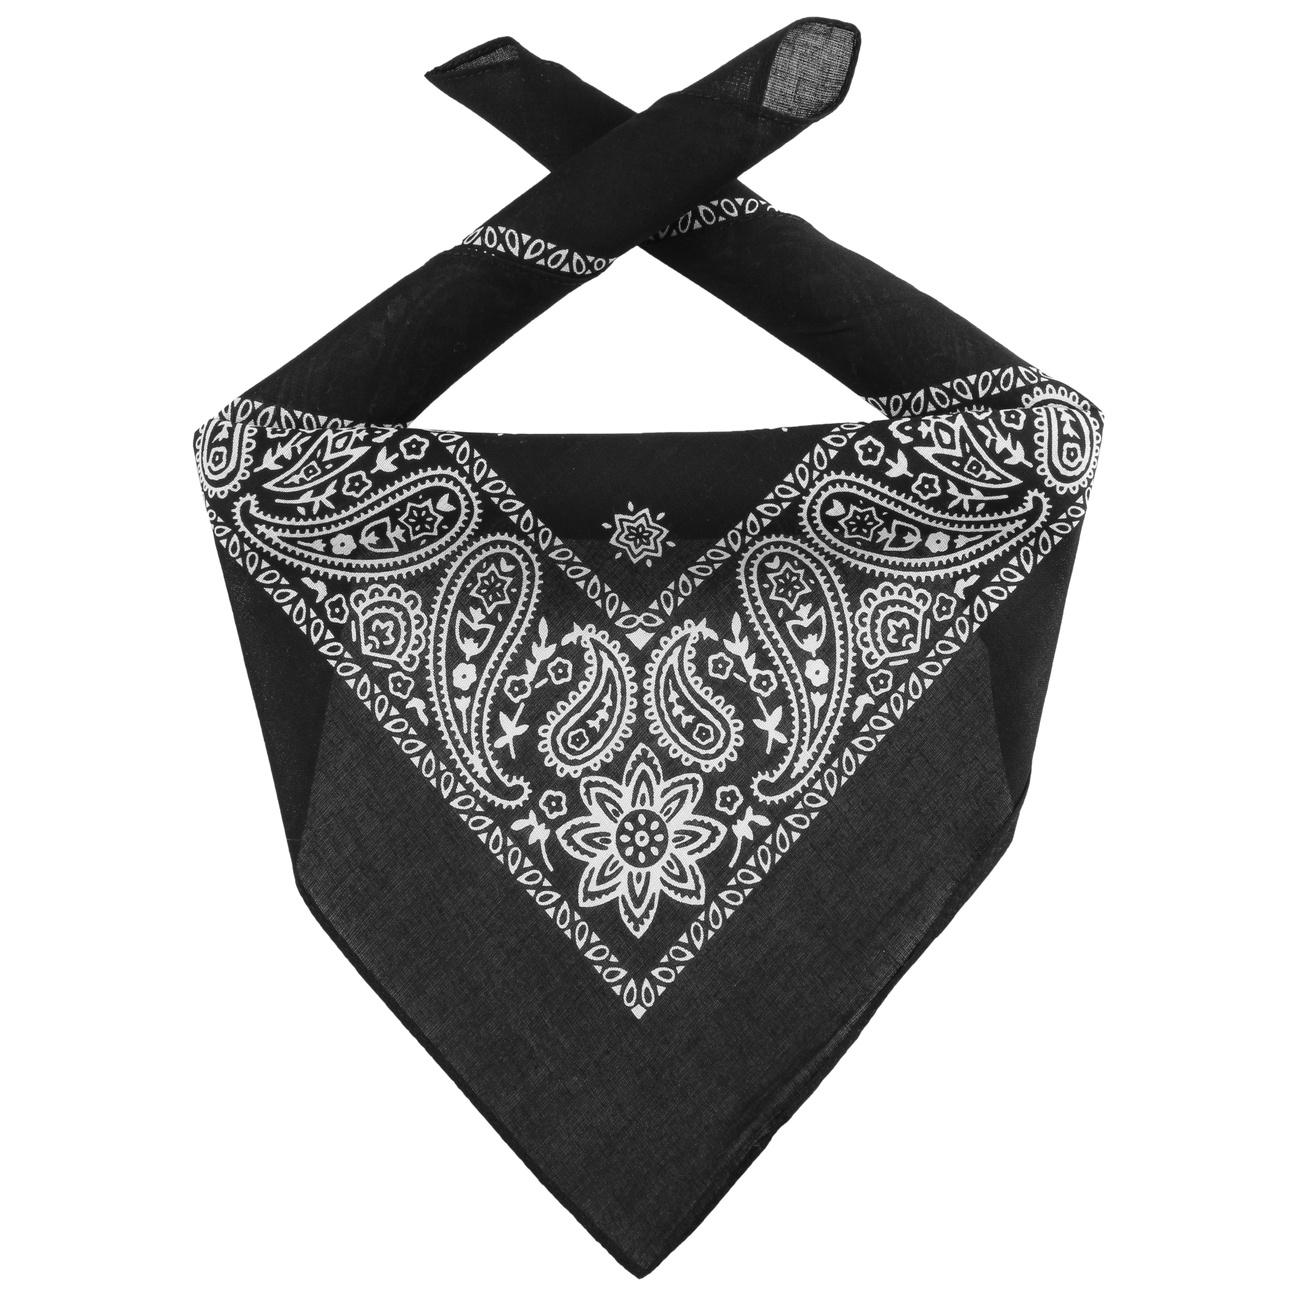 Bandana Classique by Lipodo foulards